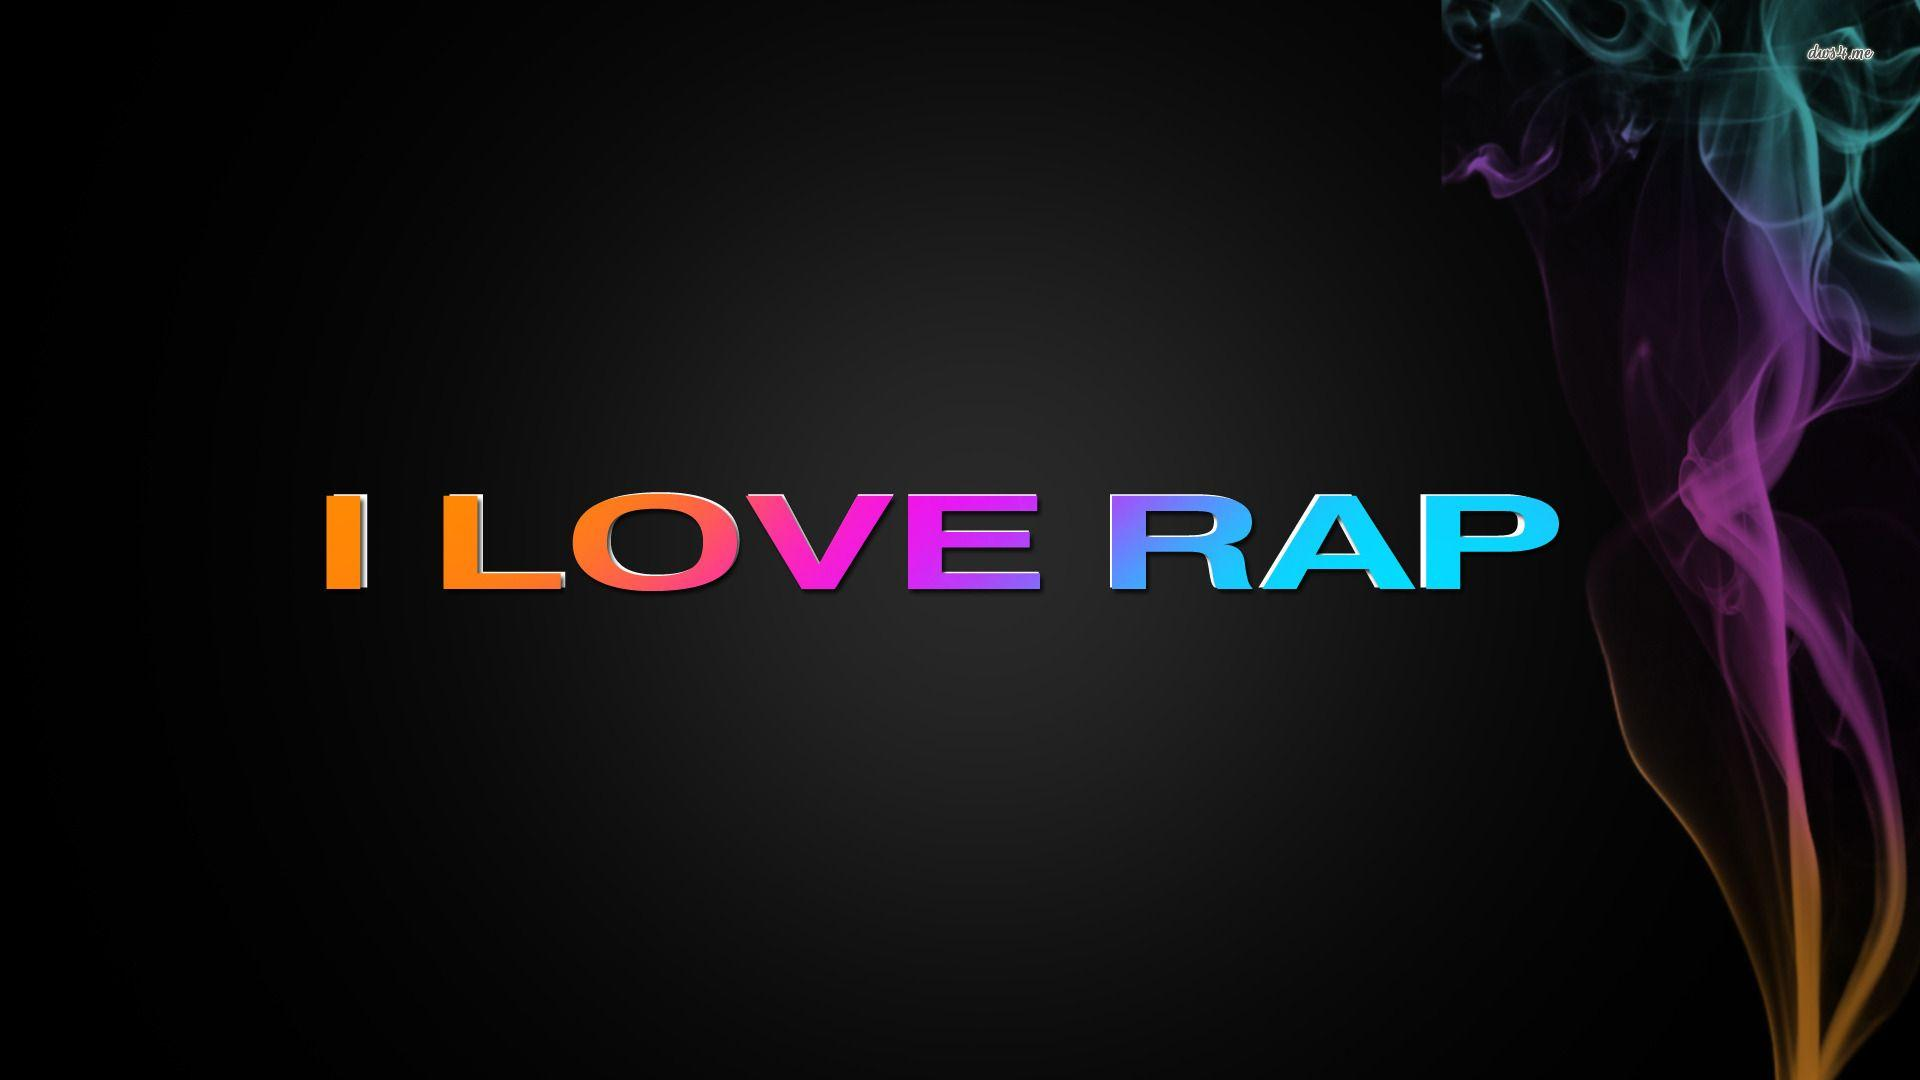 rap music wallpaper - photo #2